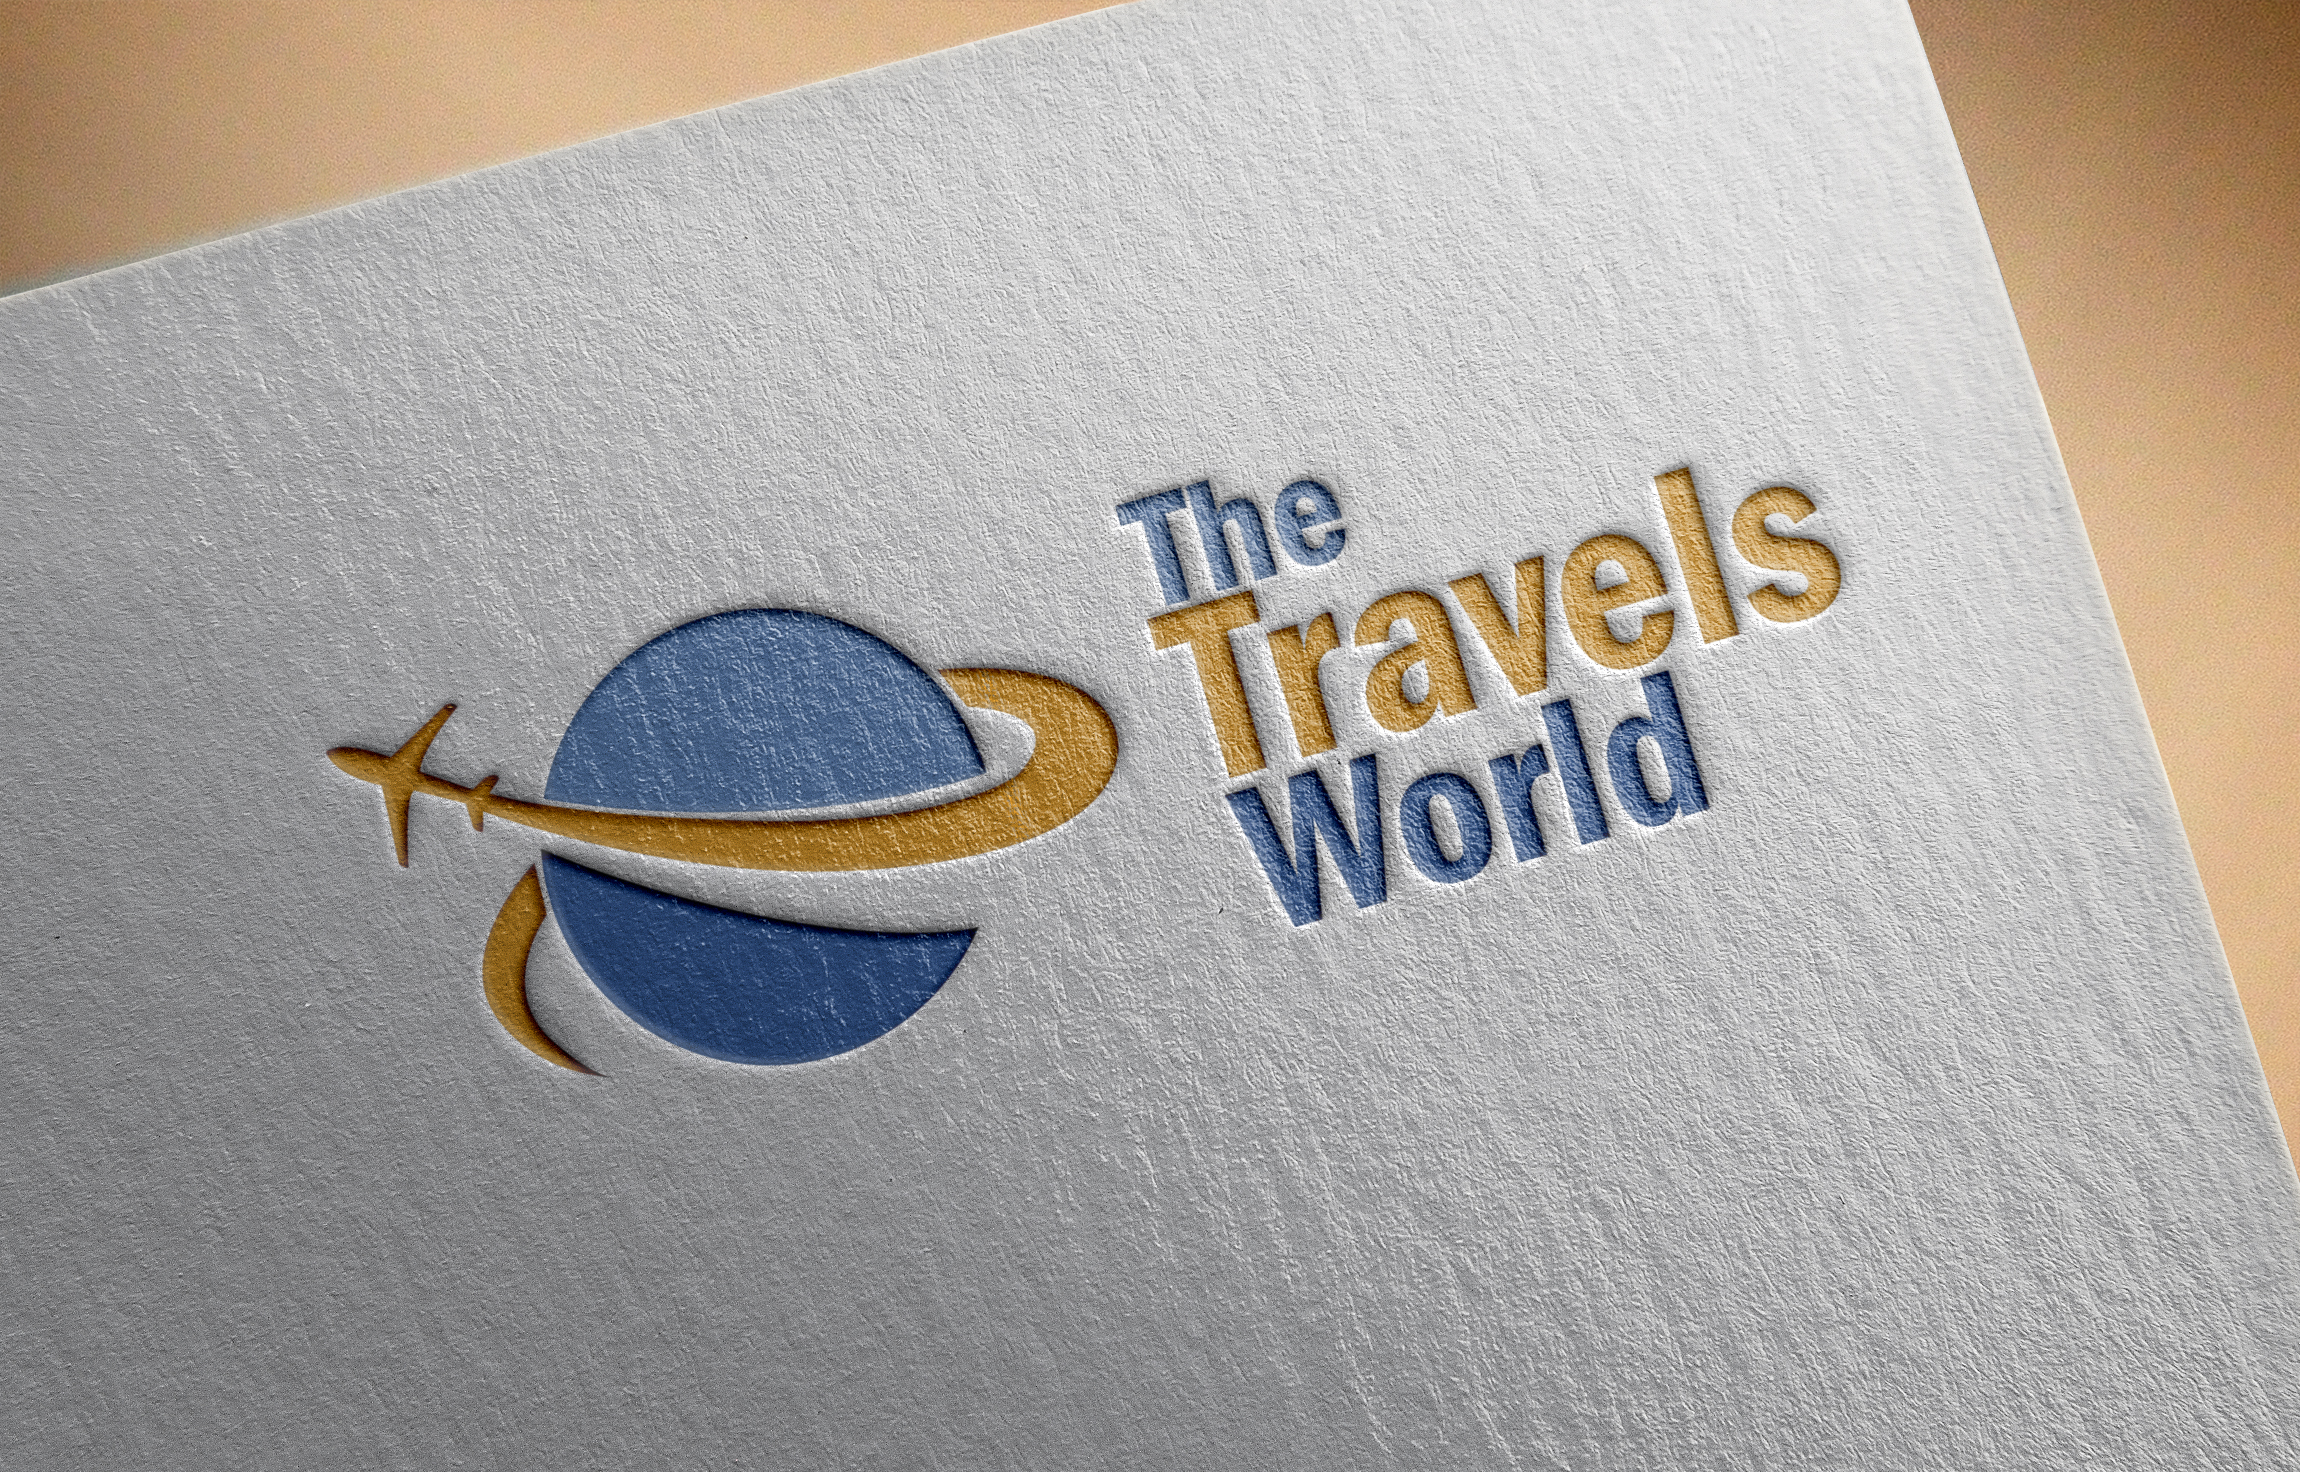 The travels world creative logo design by Badri design